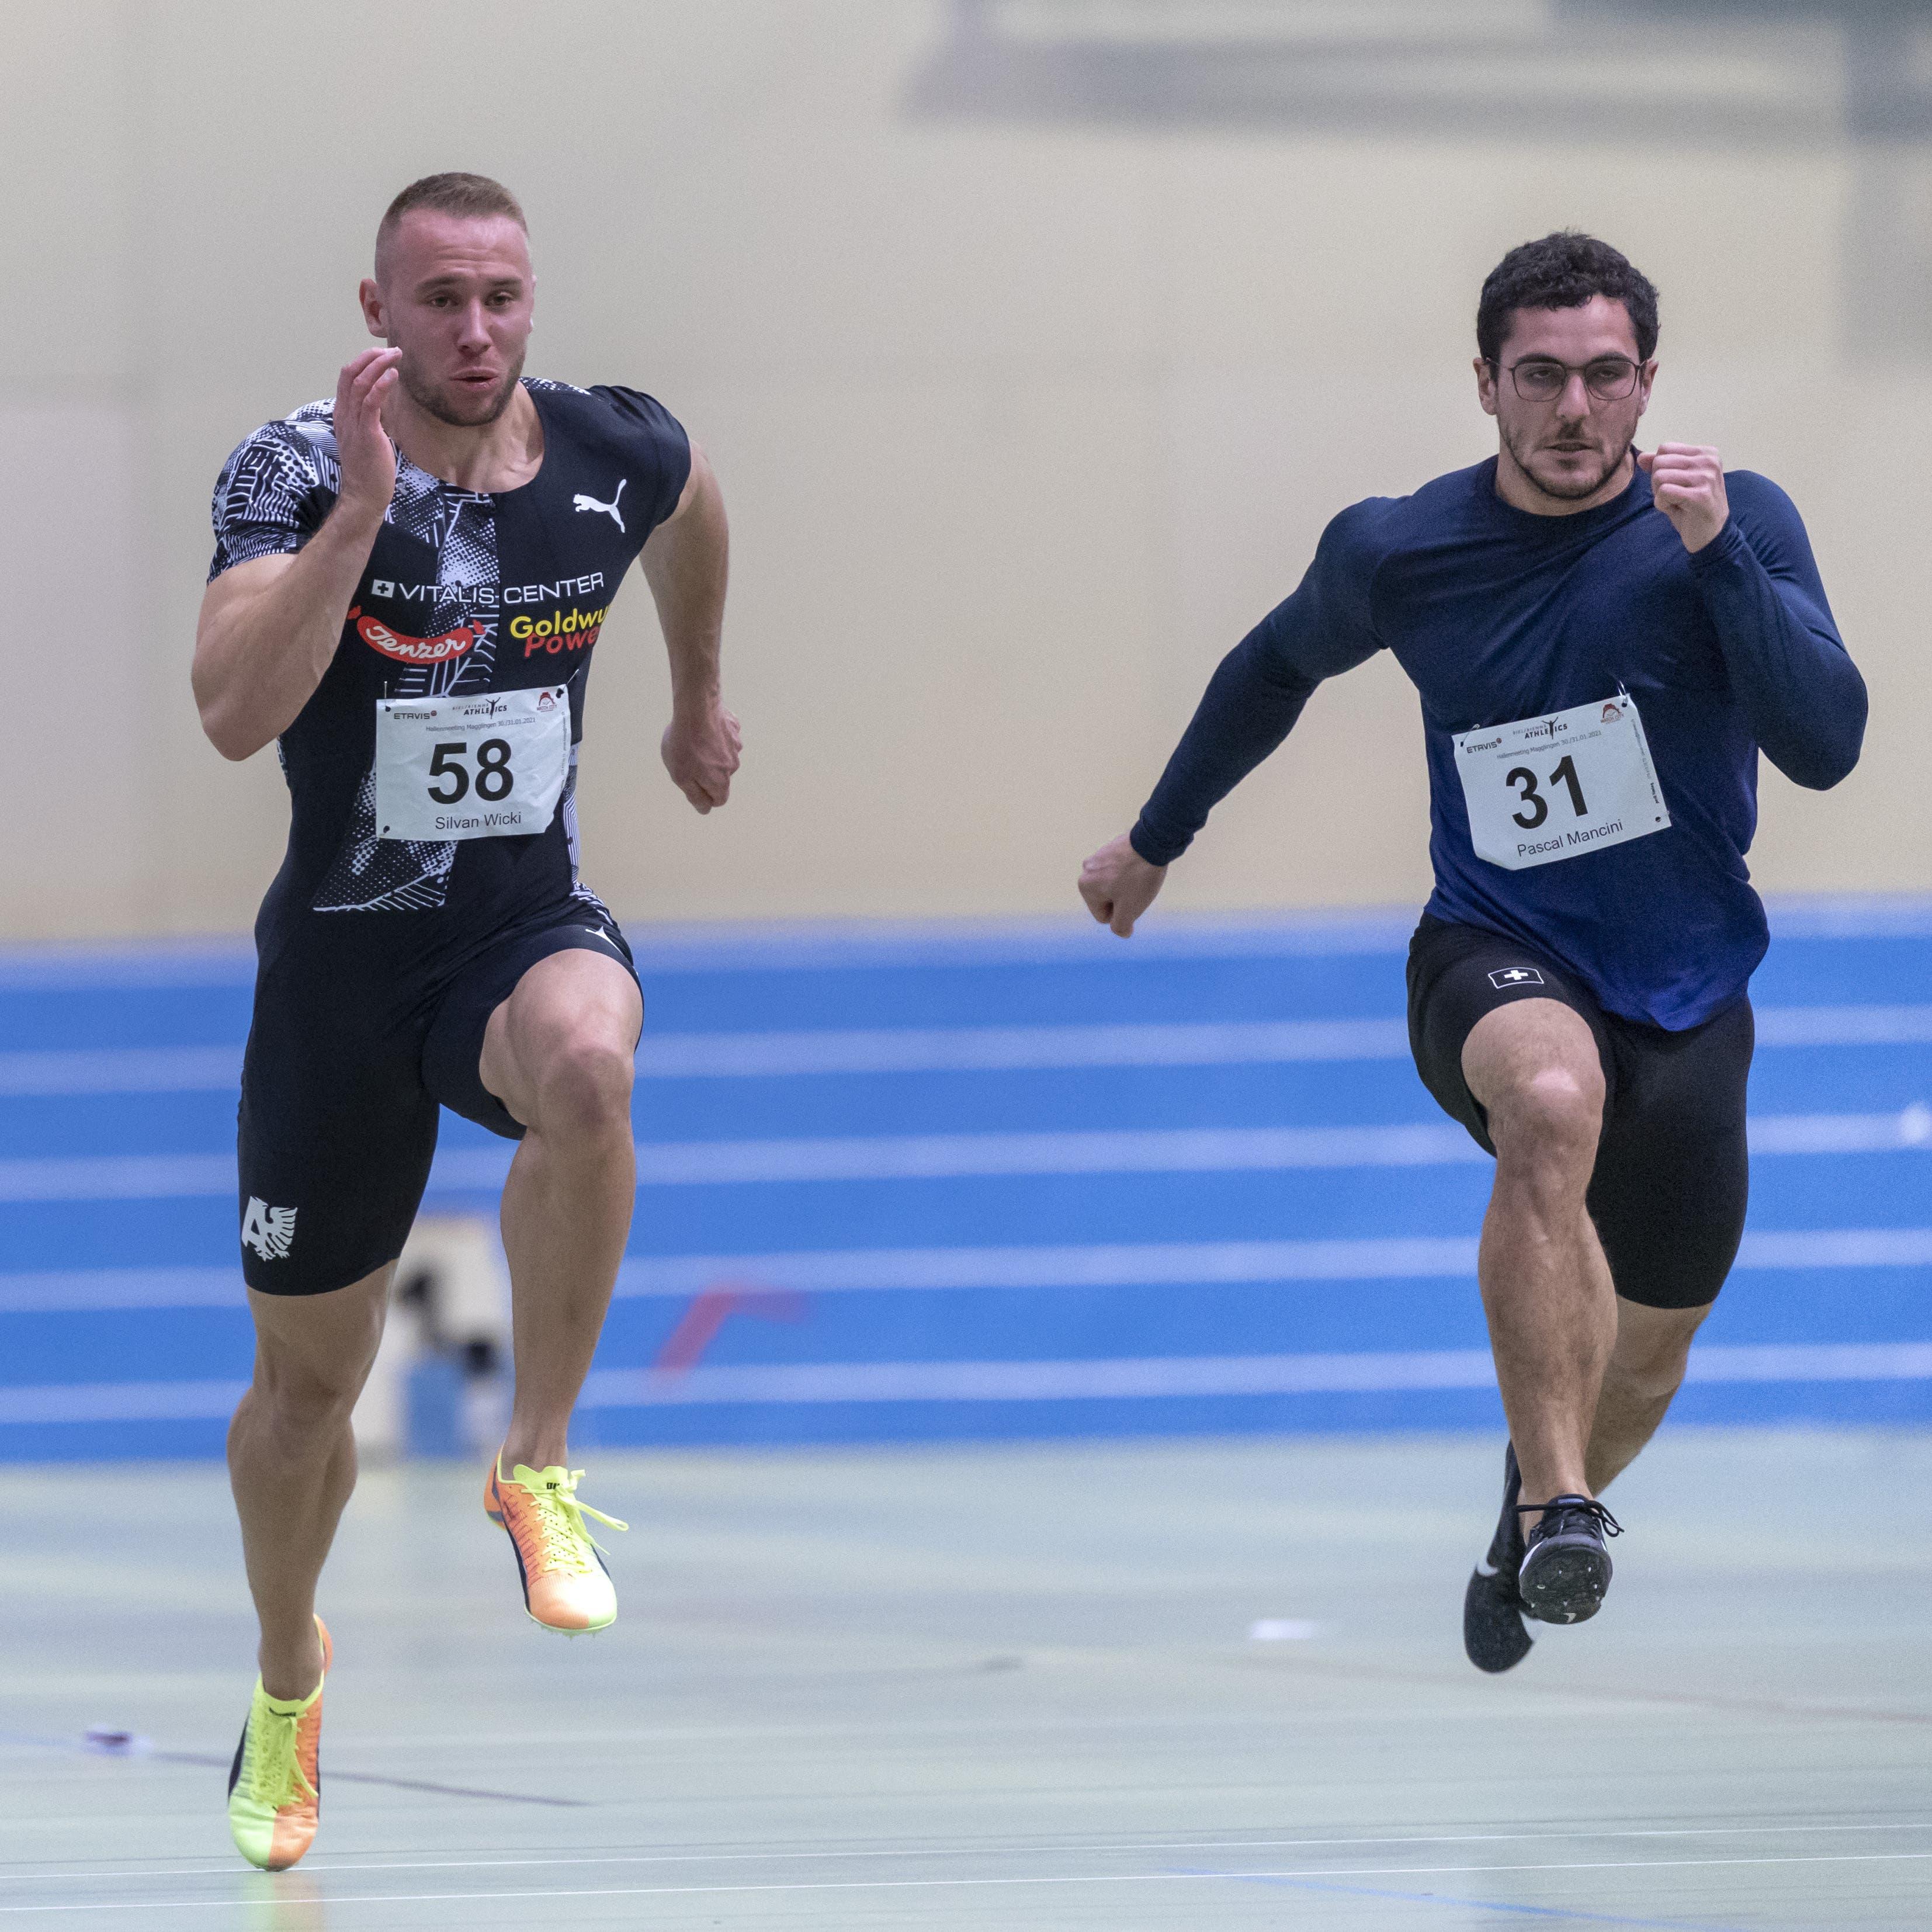 Silvan Wicki (links) und Pascal Mancini (rechts) beim Rennen über 60 Meter des Hallenmeetings in Magglingen am 30. Januar 2021.